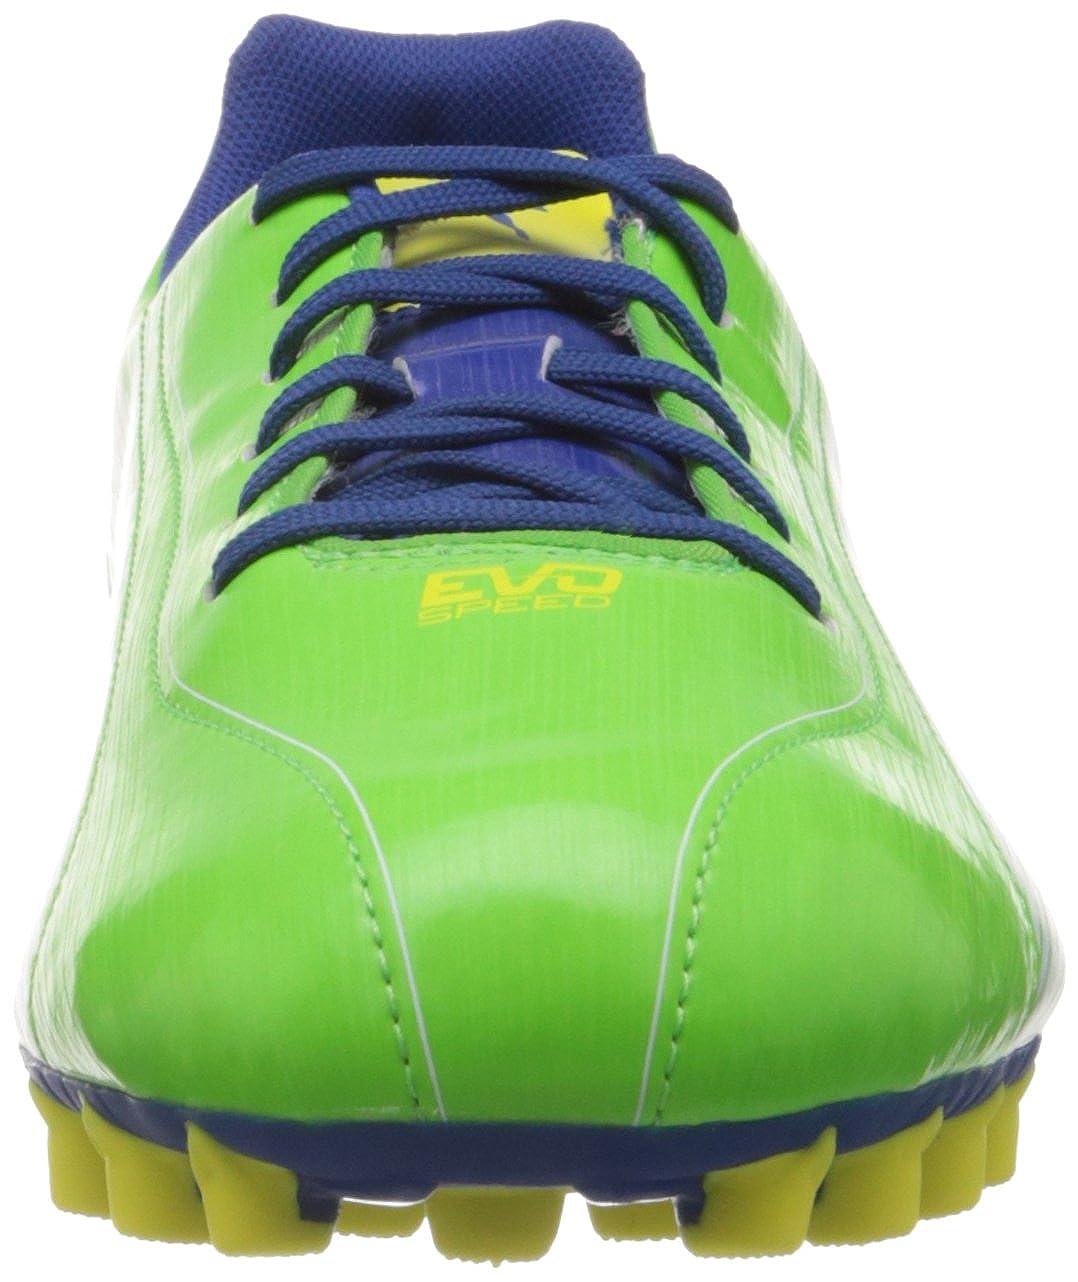 Homme De Chaussures Puma 5 Sport Ag Evospeed gxwIx0YqzO